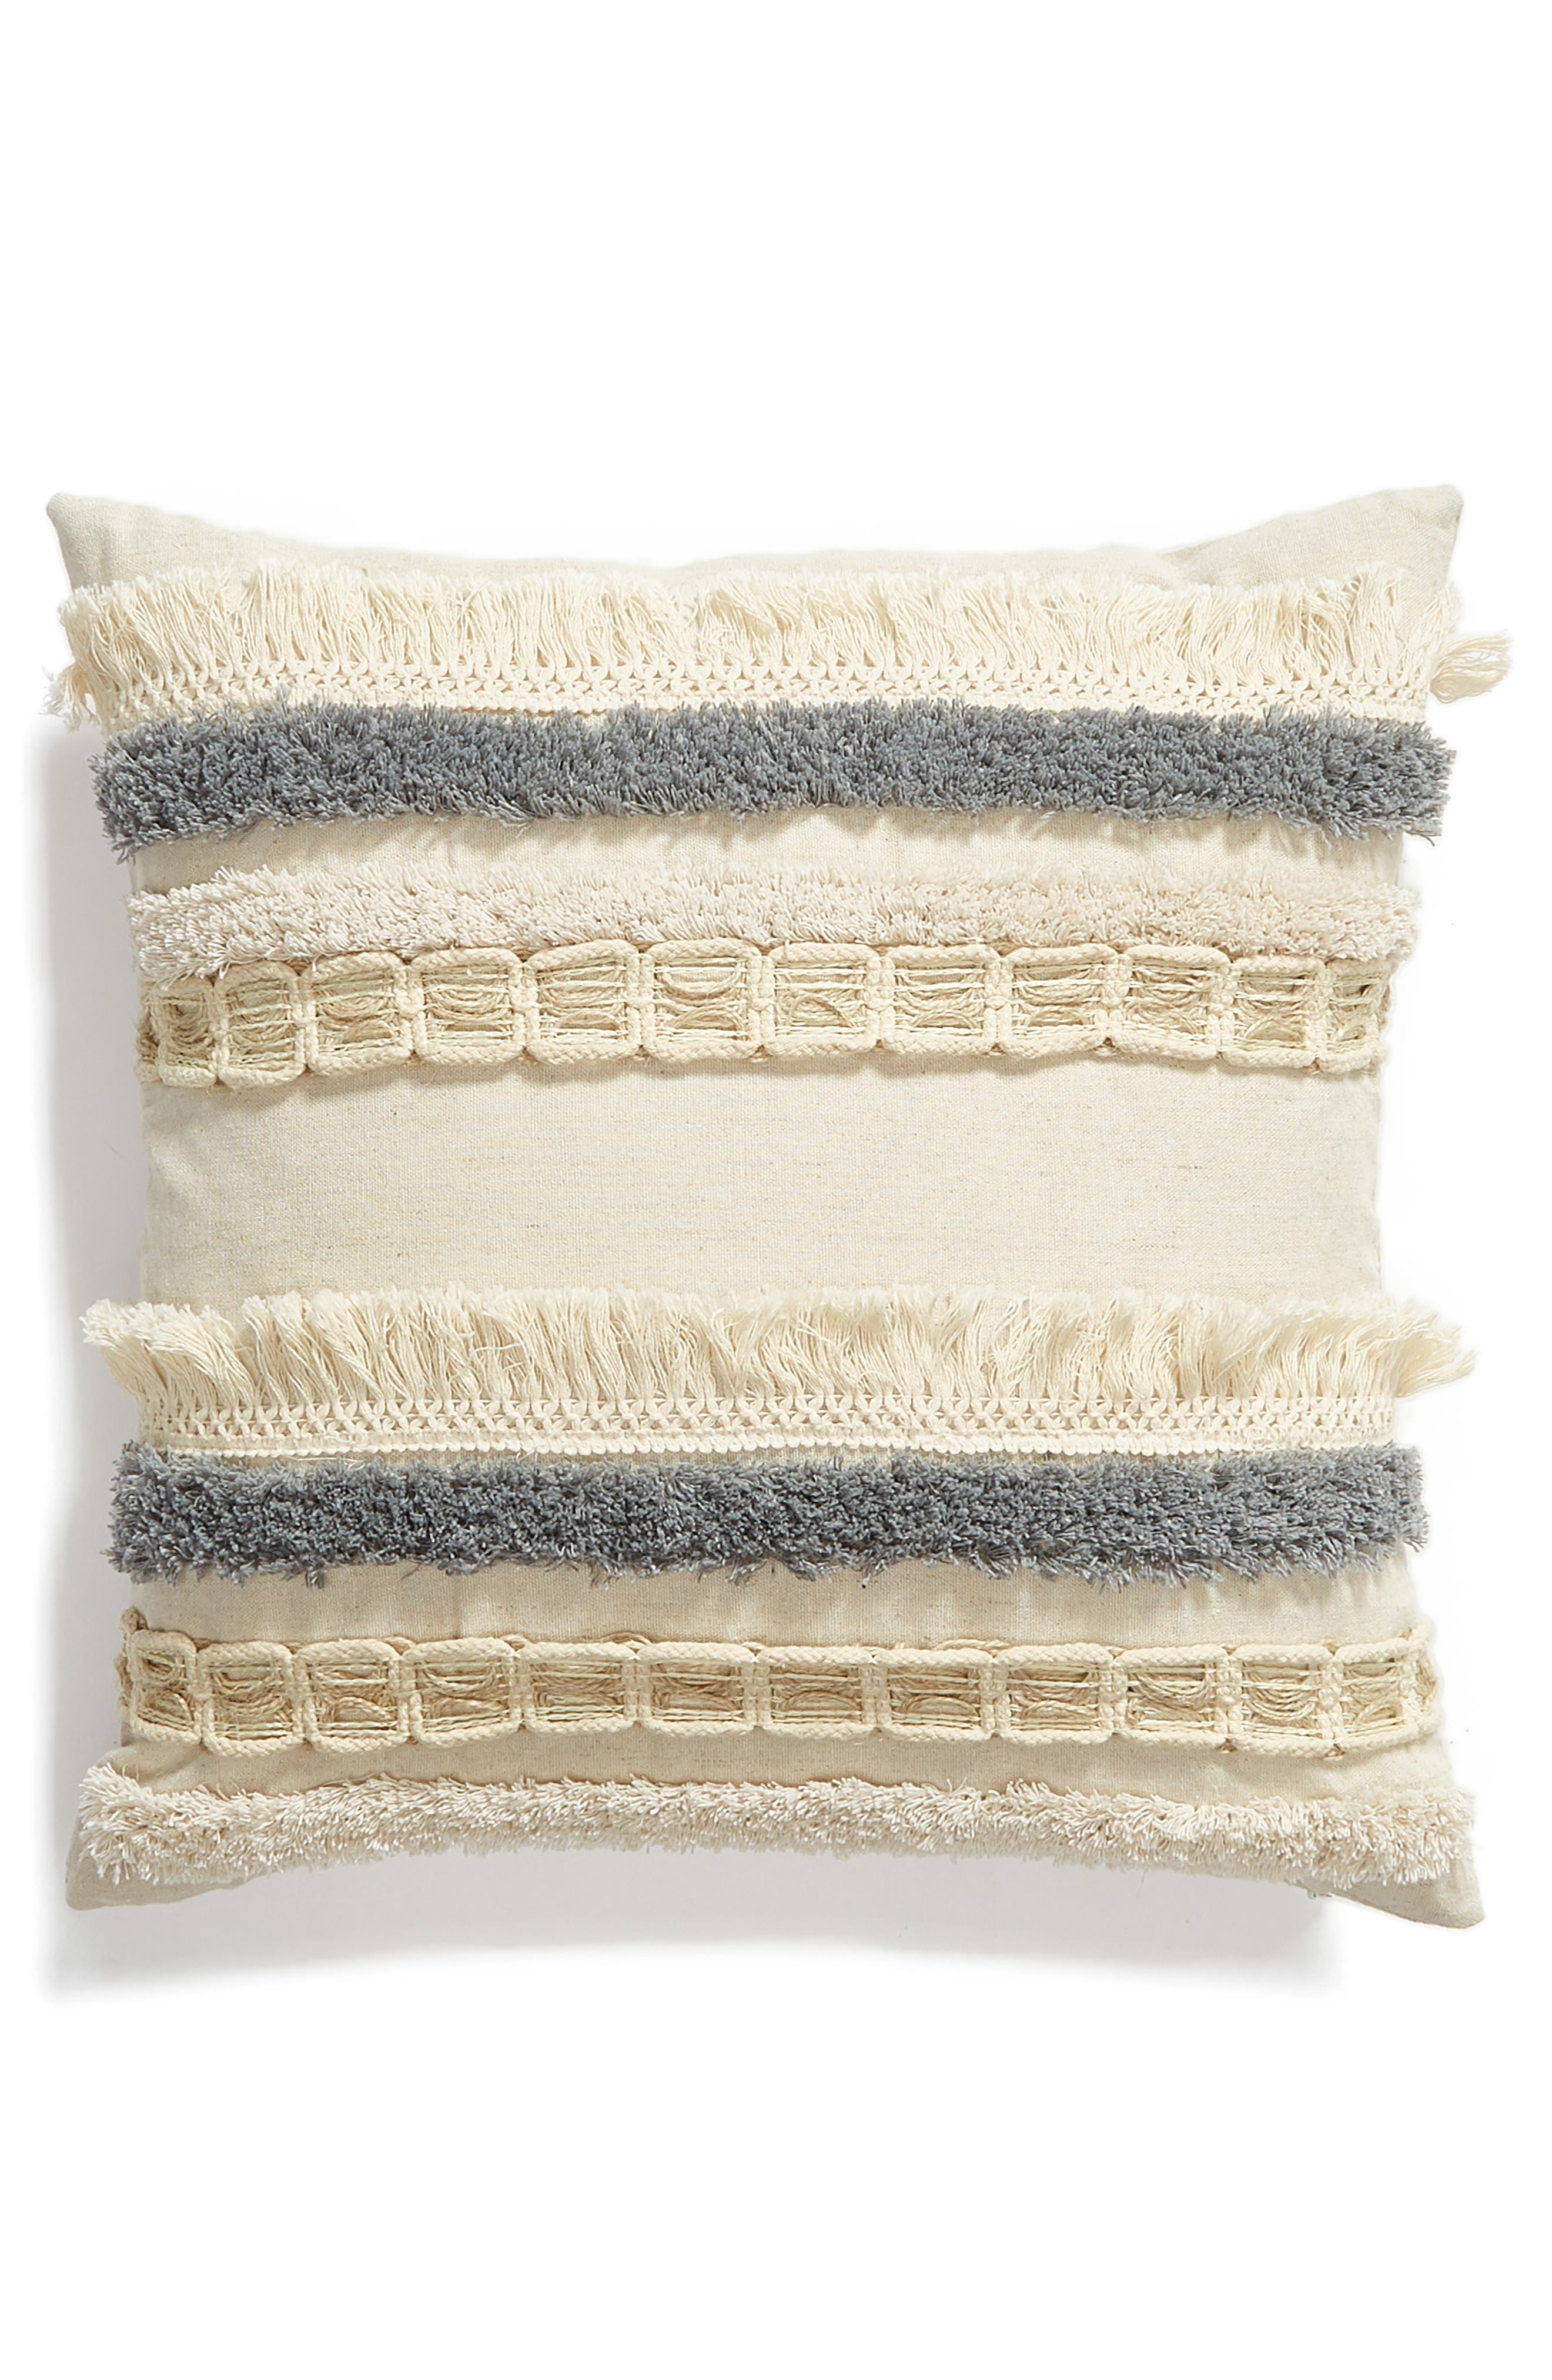 LEVTEX Hilo Fringe Accent Pillow, Main, color, NATURAL